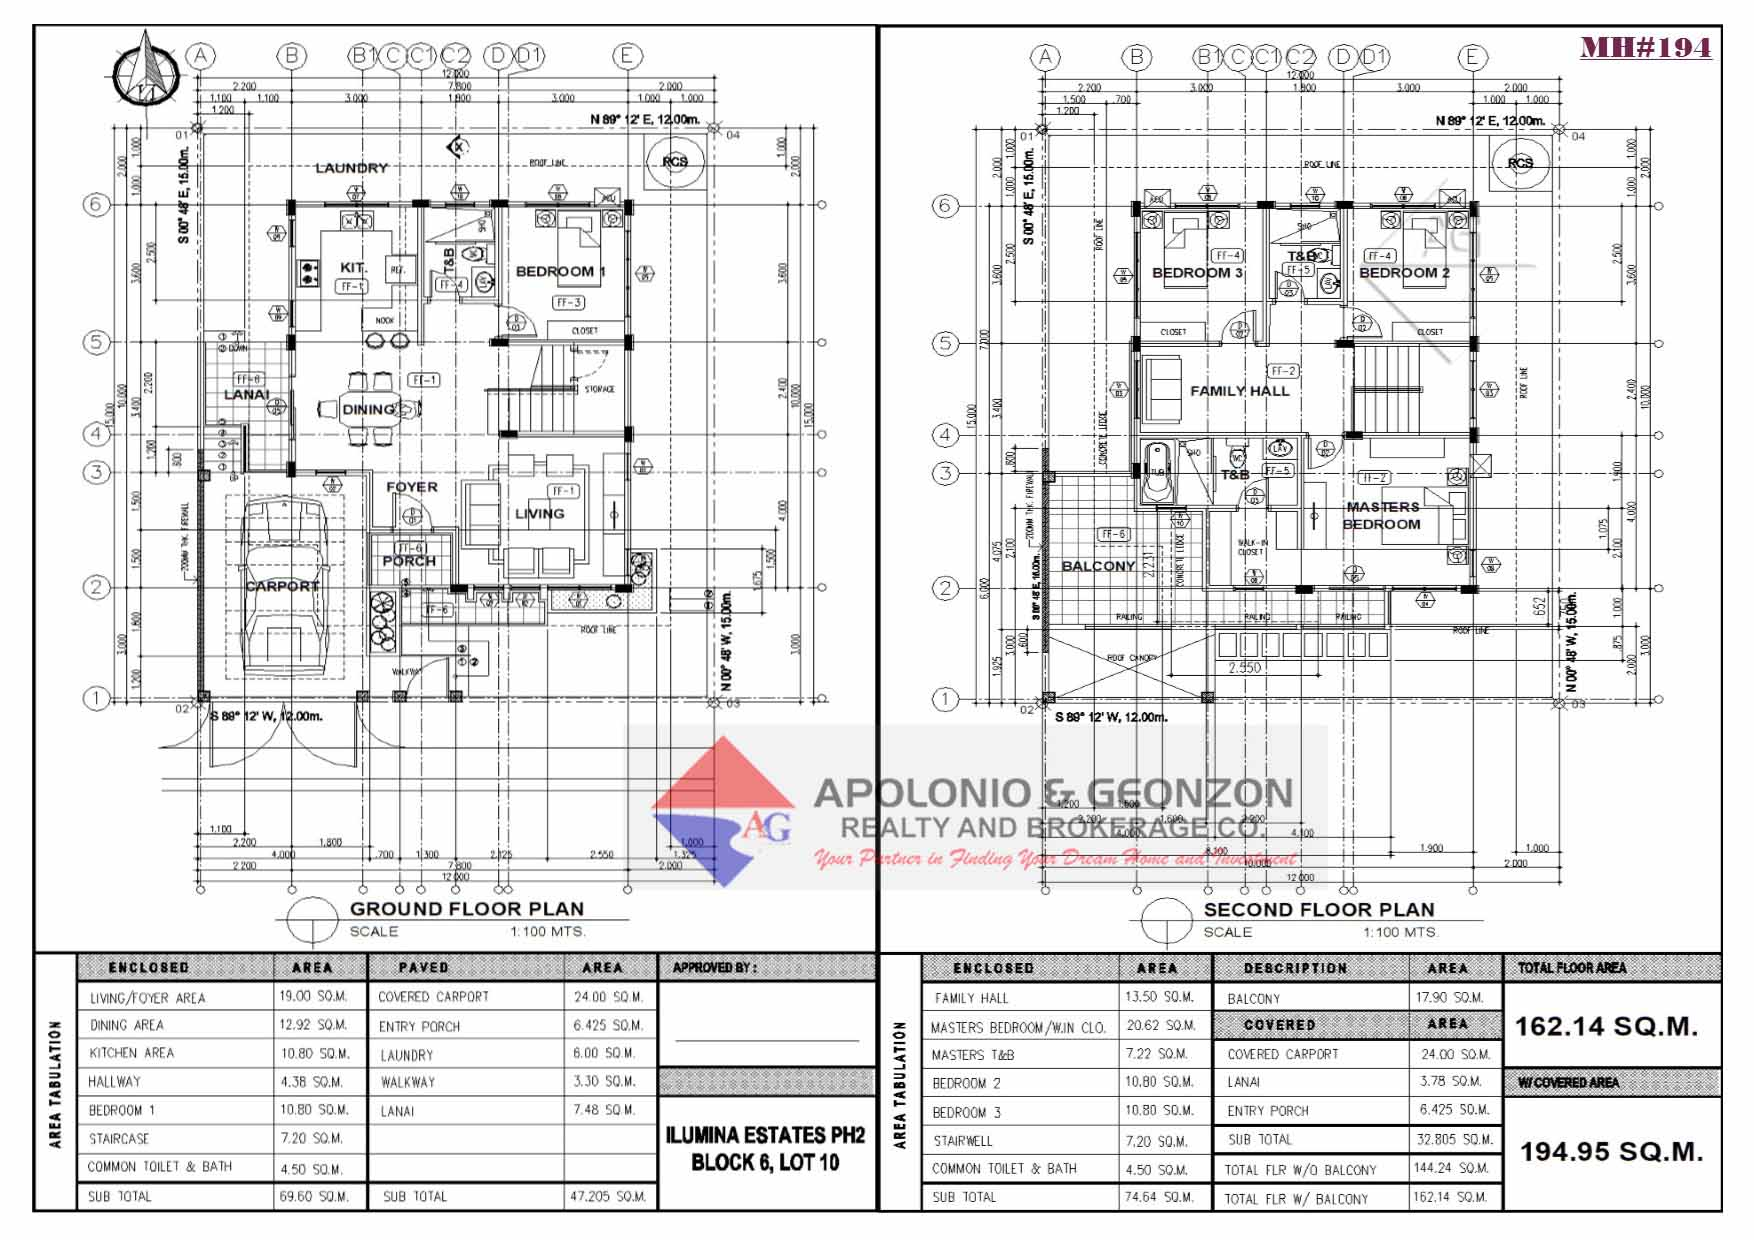 ilumina-estates-2-storey-house-floor-plan-194